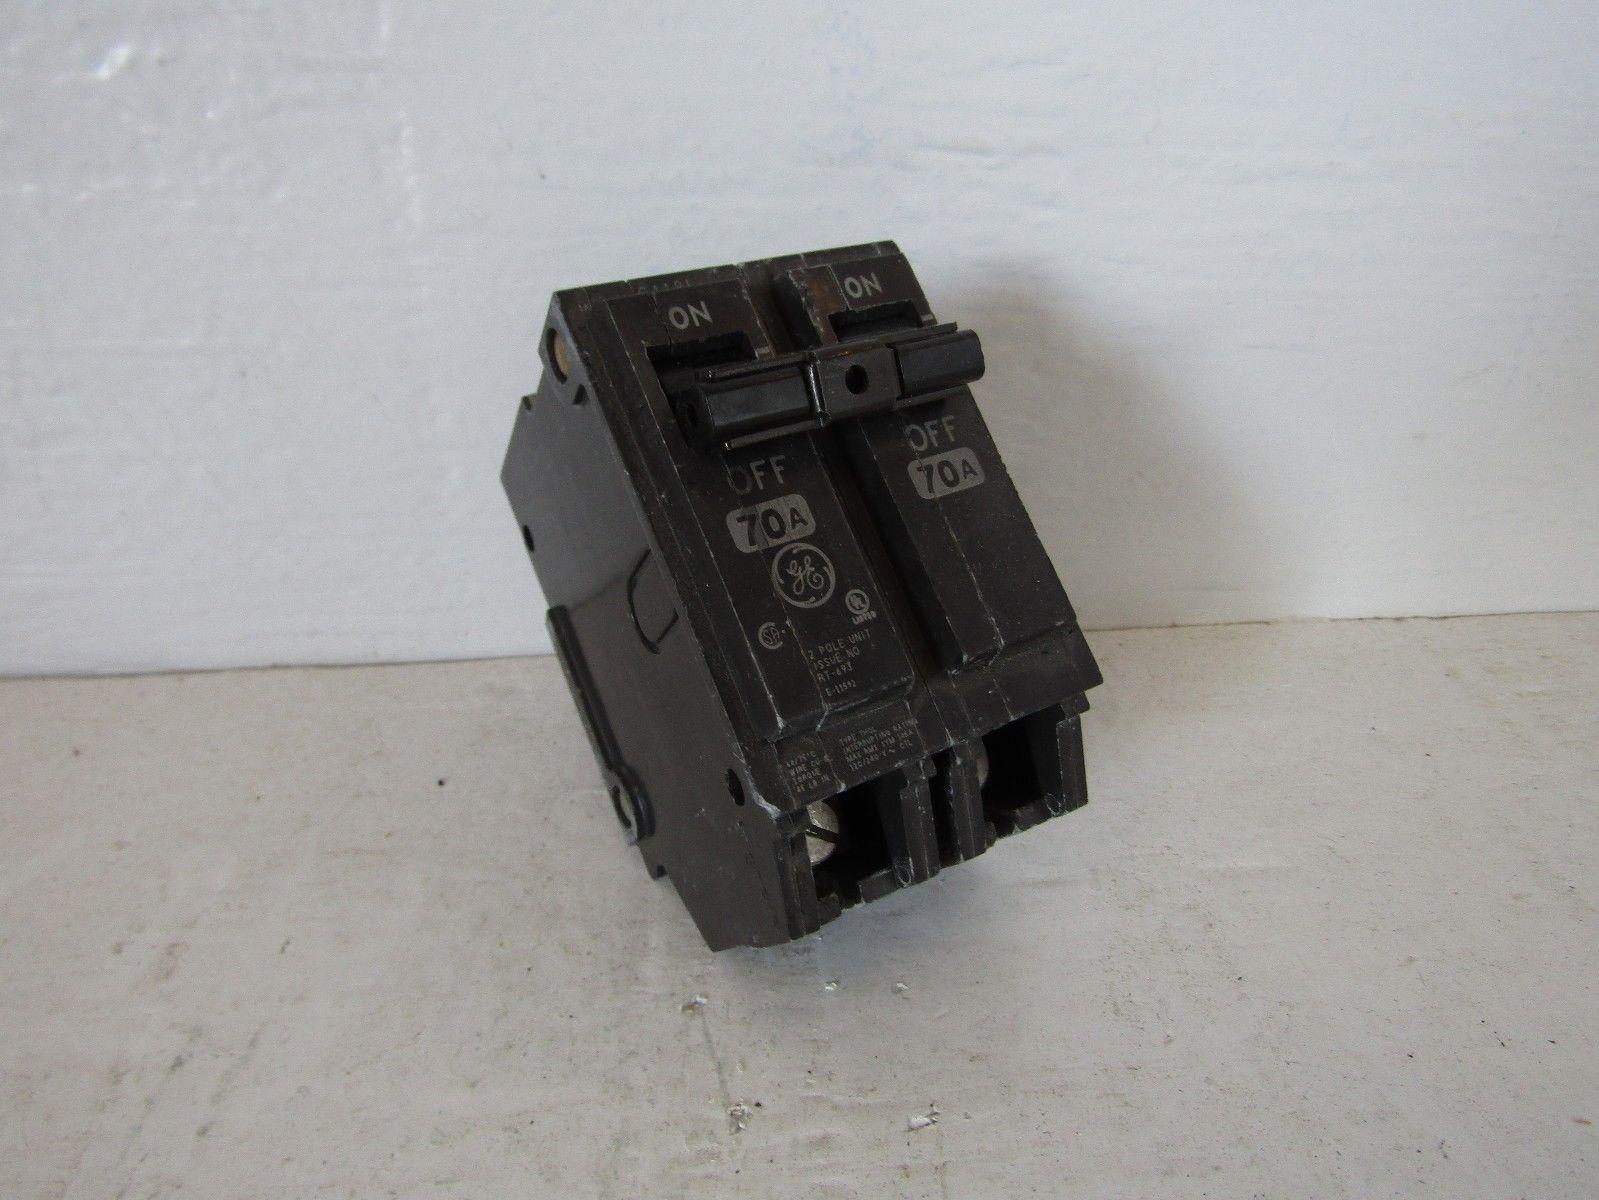 NEW GE THQL2170 2 POLE 70 AMP 240 VOLT PLUG IN CIRCUIT BREAKER ...